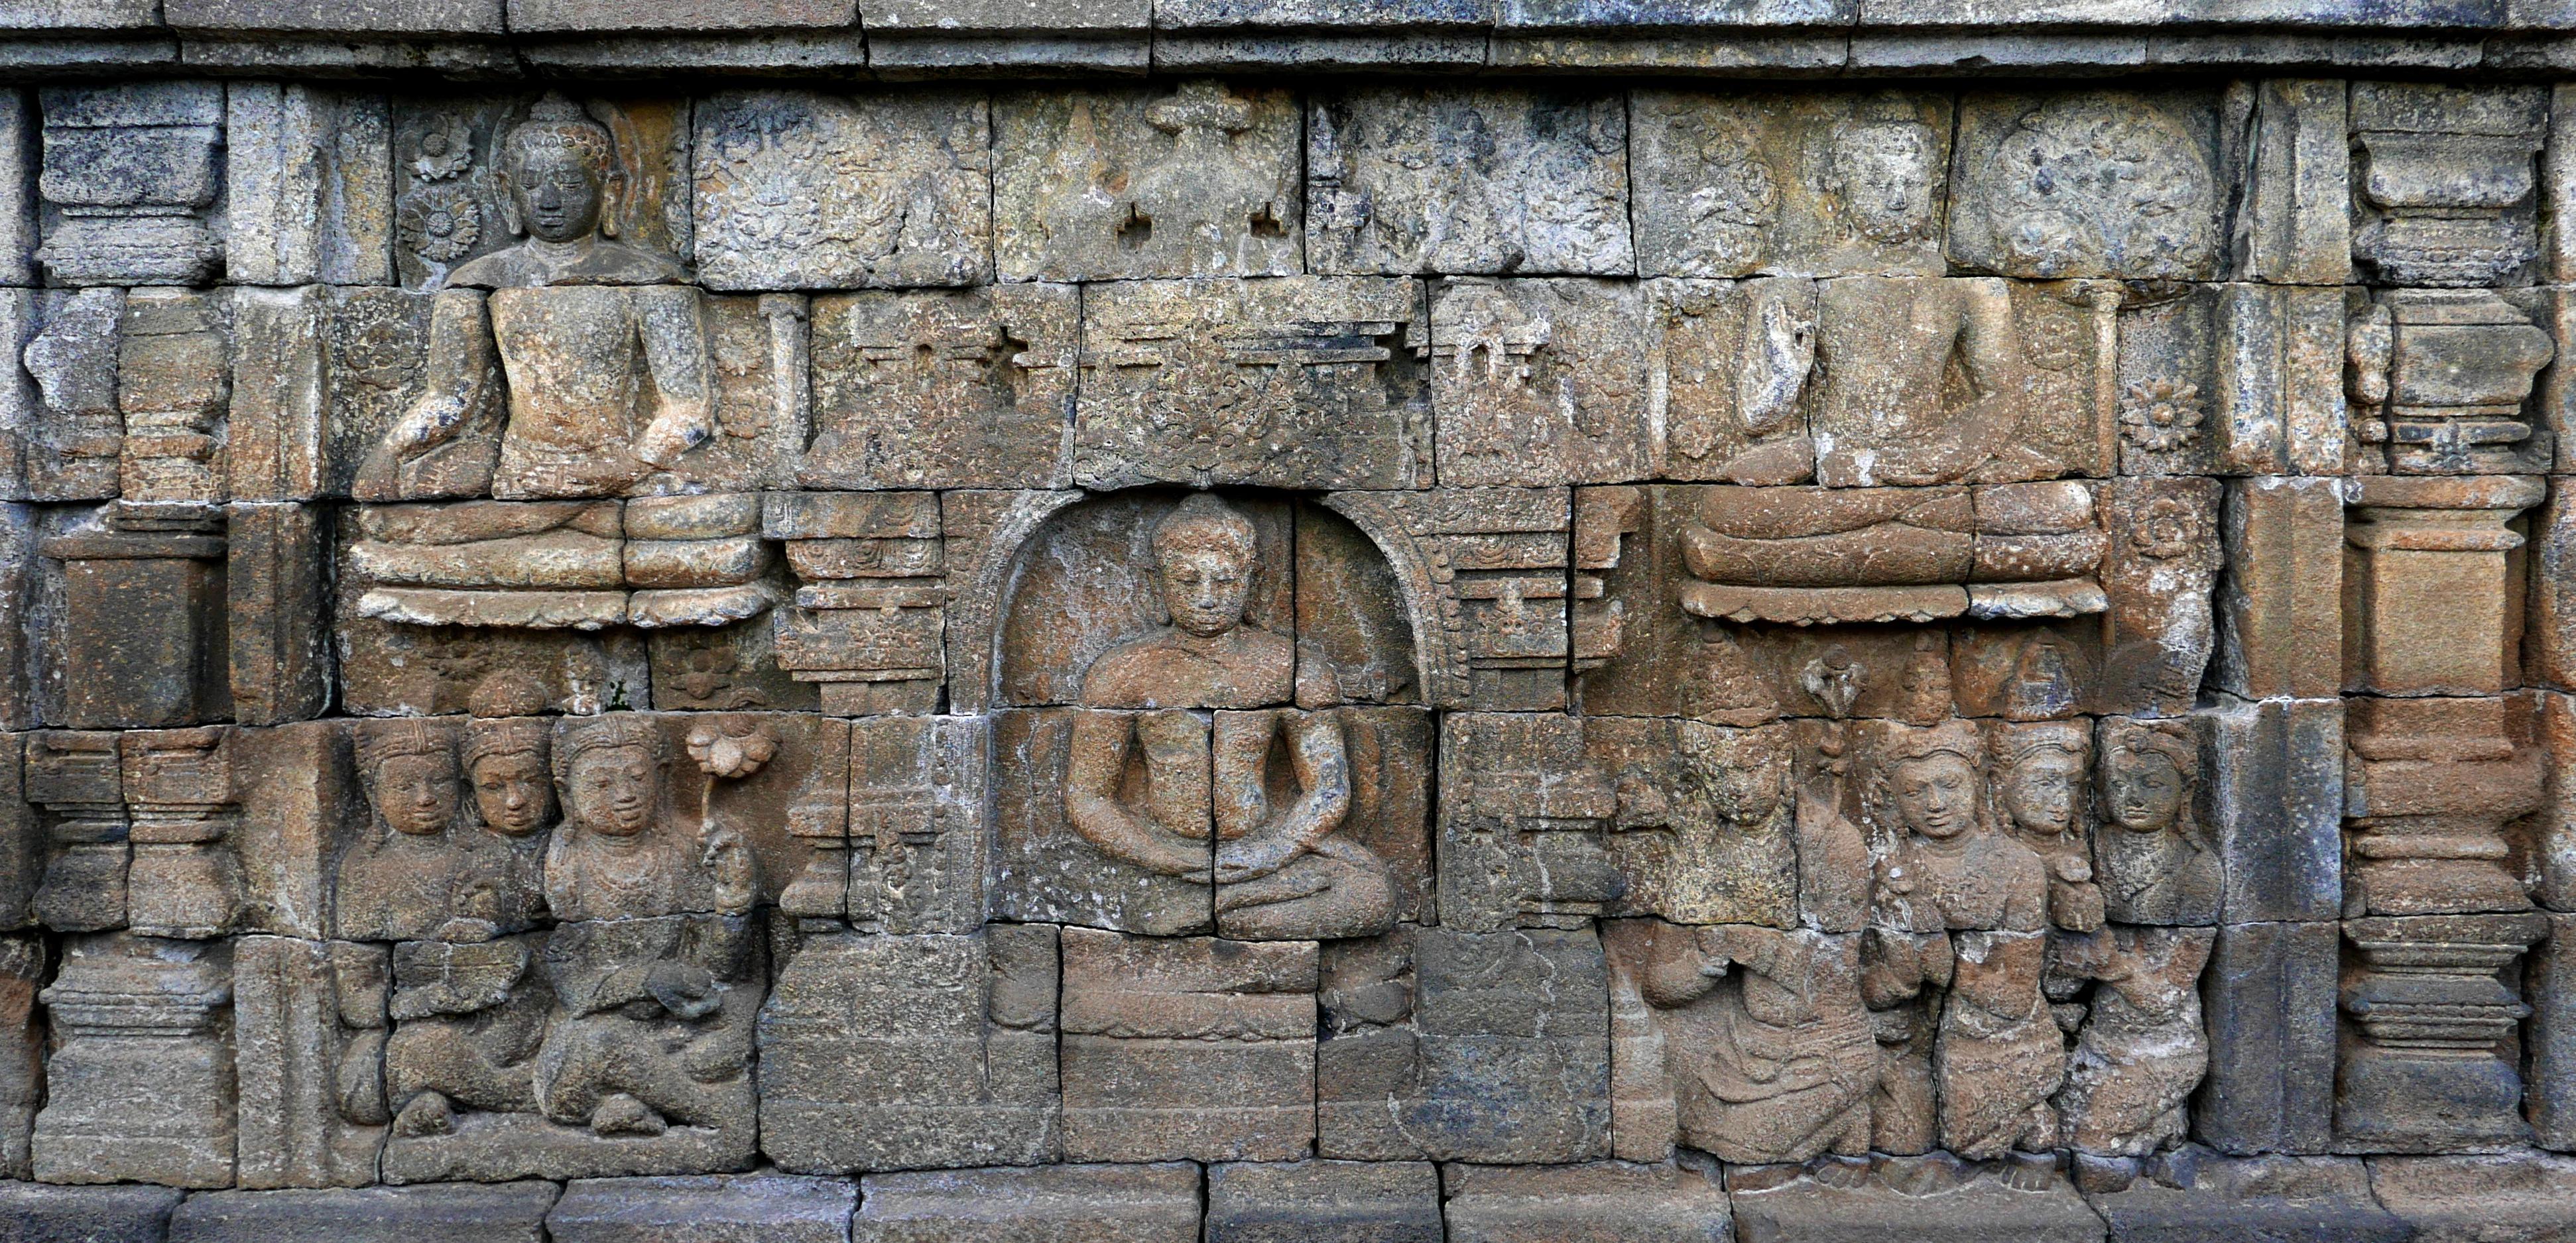 Amsterdam/Borobudur-images-of-Samantabhadra_3.jpg